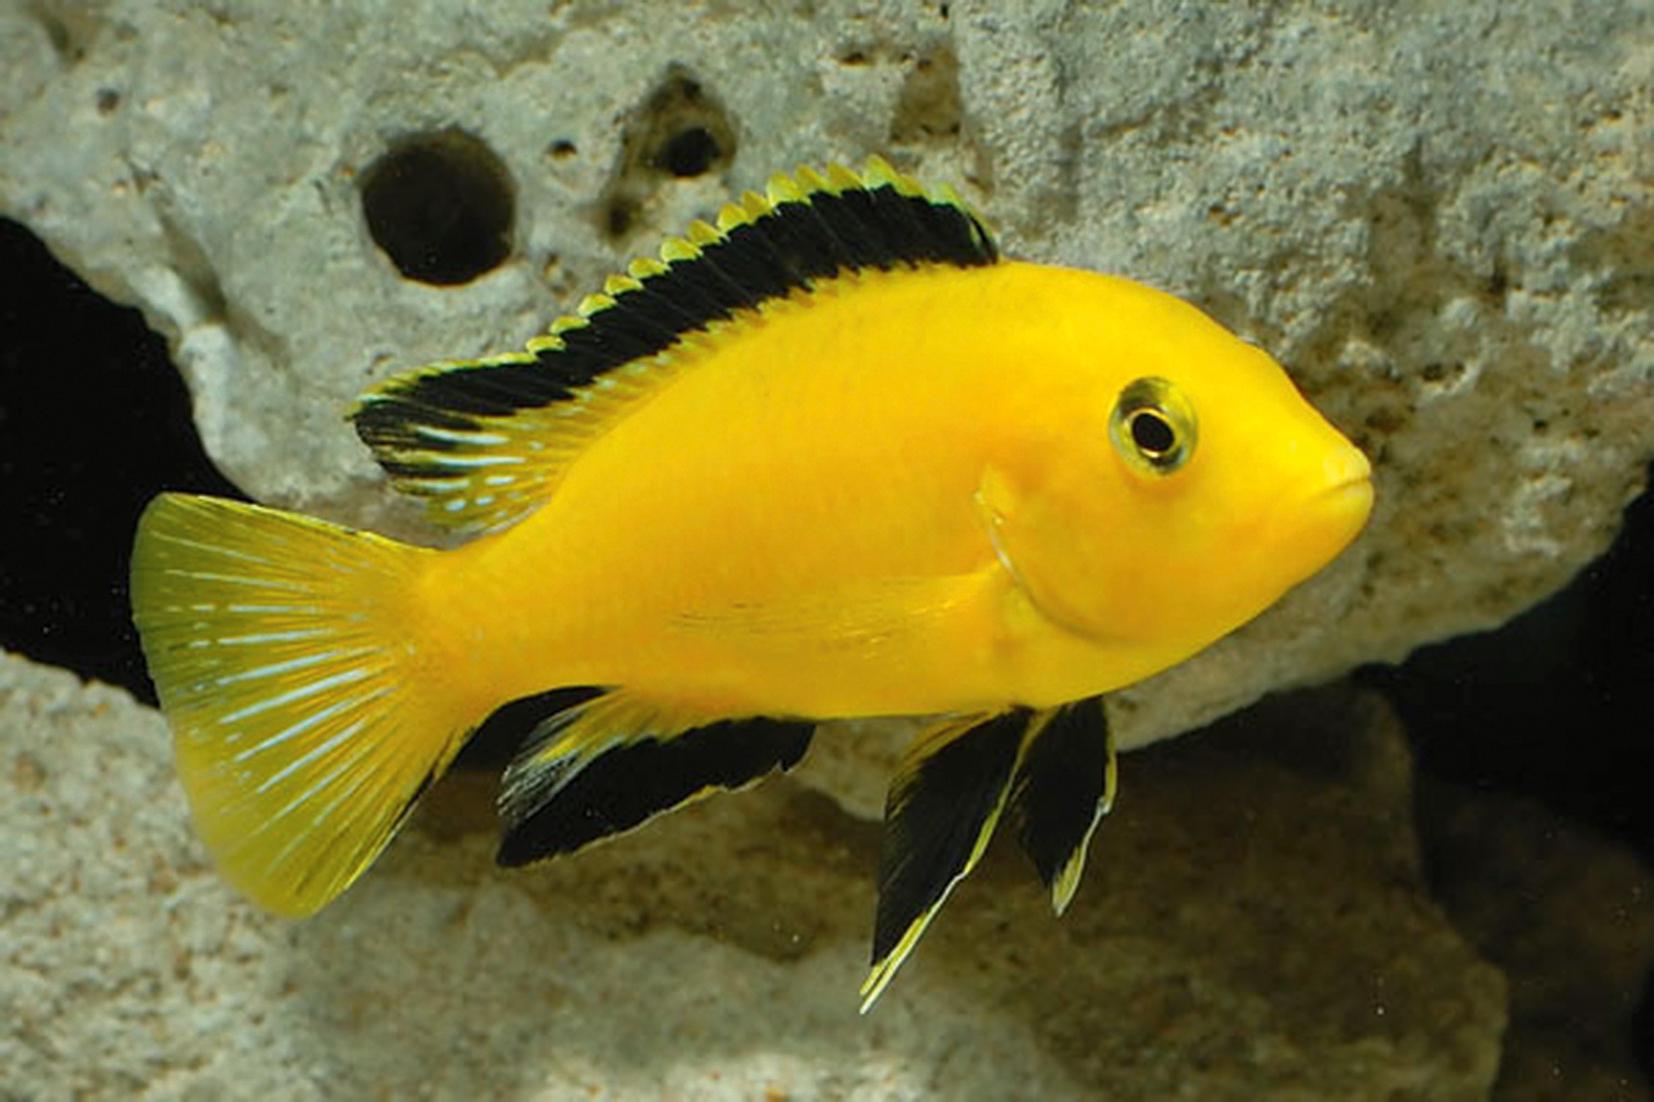 3.-Labidochromis-caeruleus-Electric-Yellow.jpg